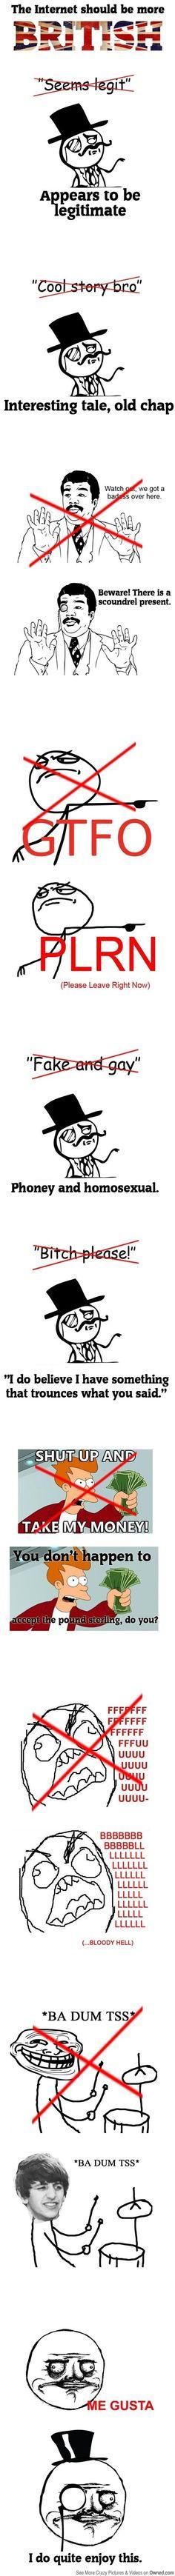 funny image, internet, memes, british